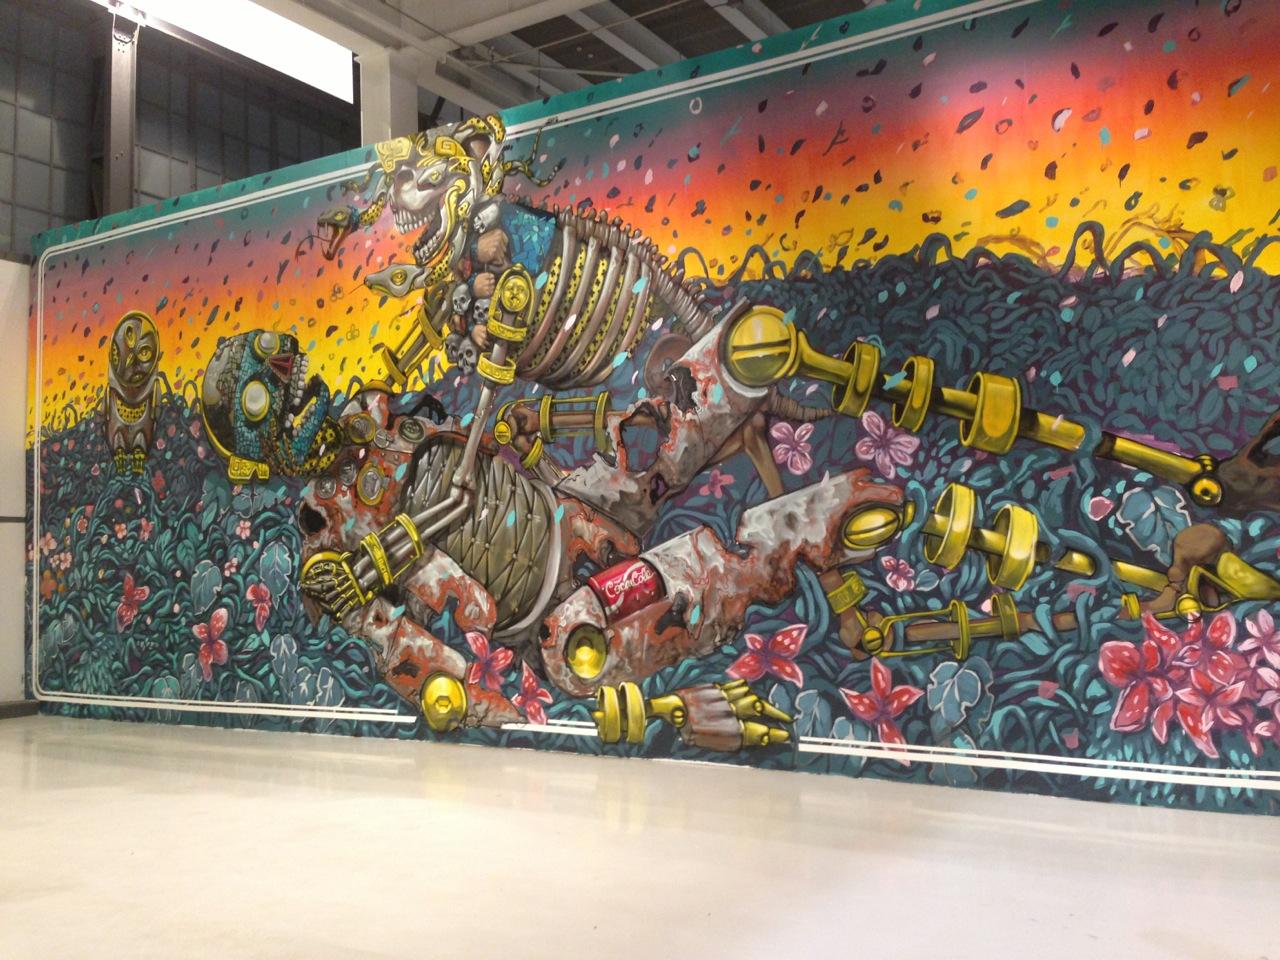 pixel pancho new mural in mexico city mexico streetartnews streetartnews